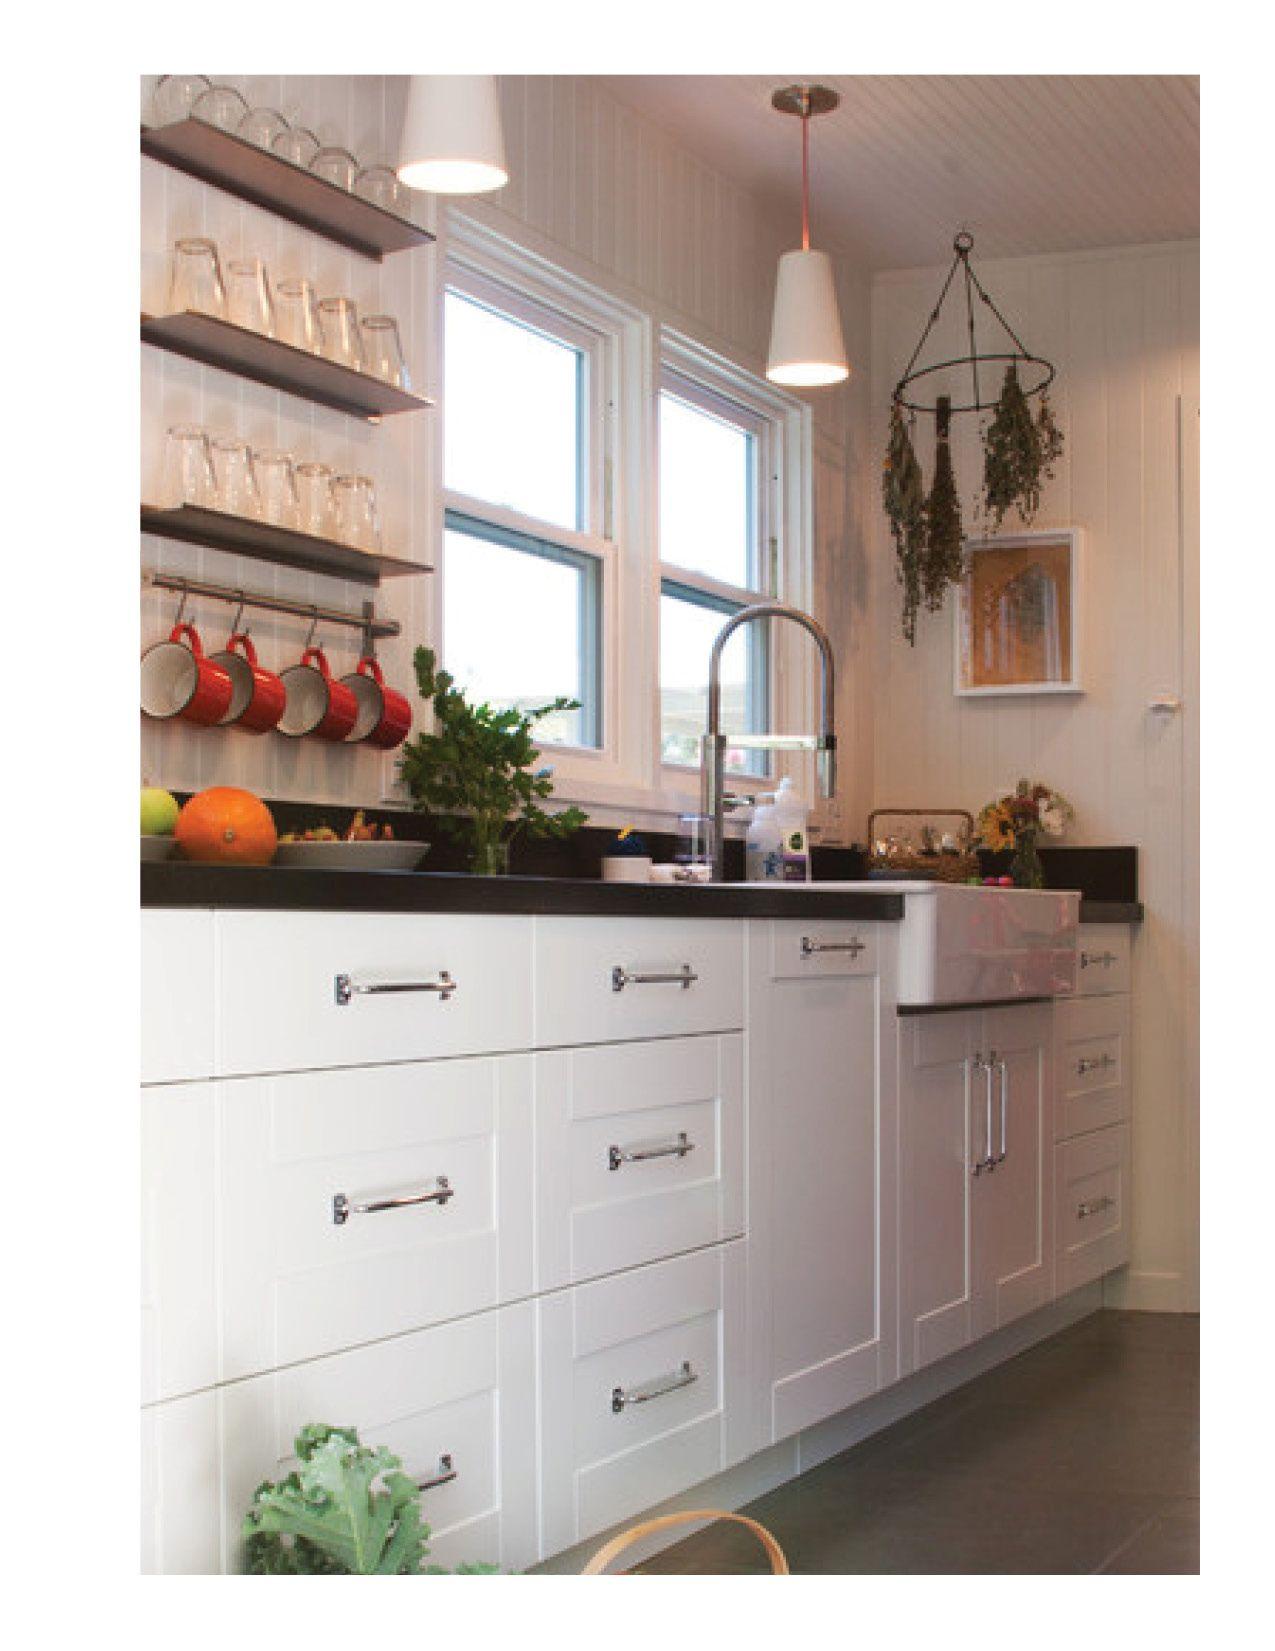 shelves for glasses and mugs mommy s kitchen project in 2018 rh pinterest com shelving for glassware shelving for glassware